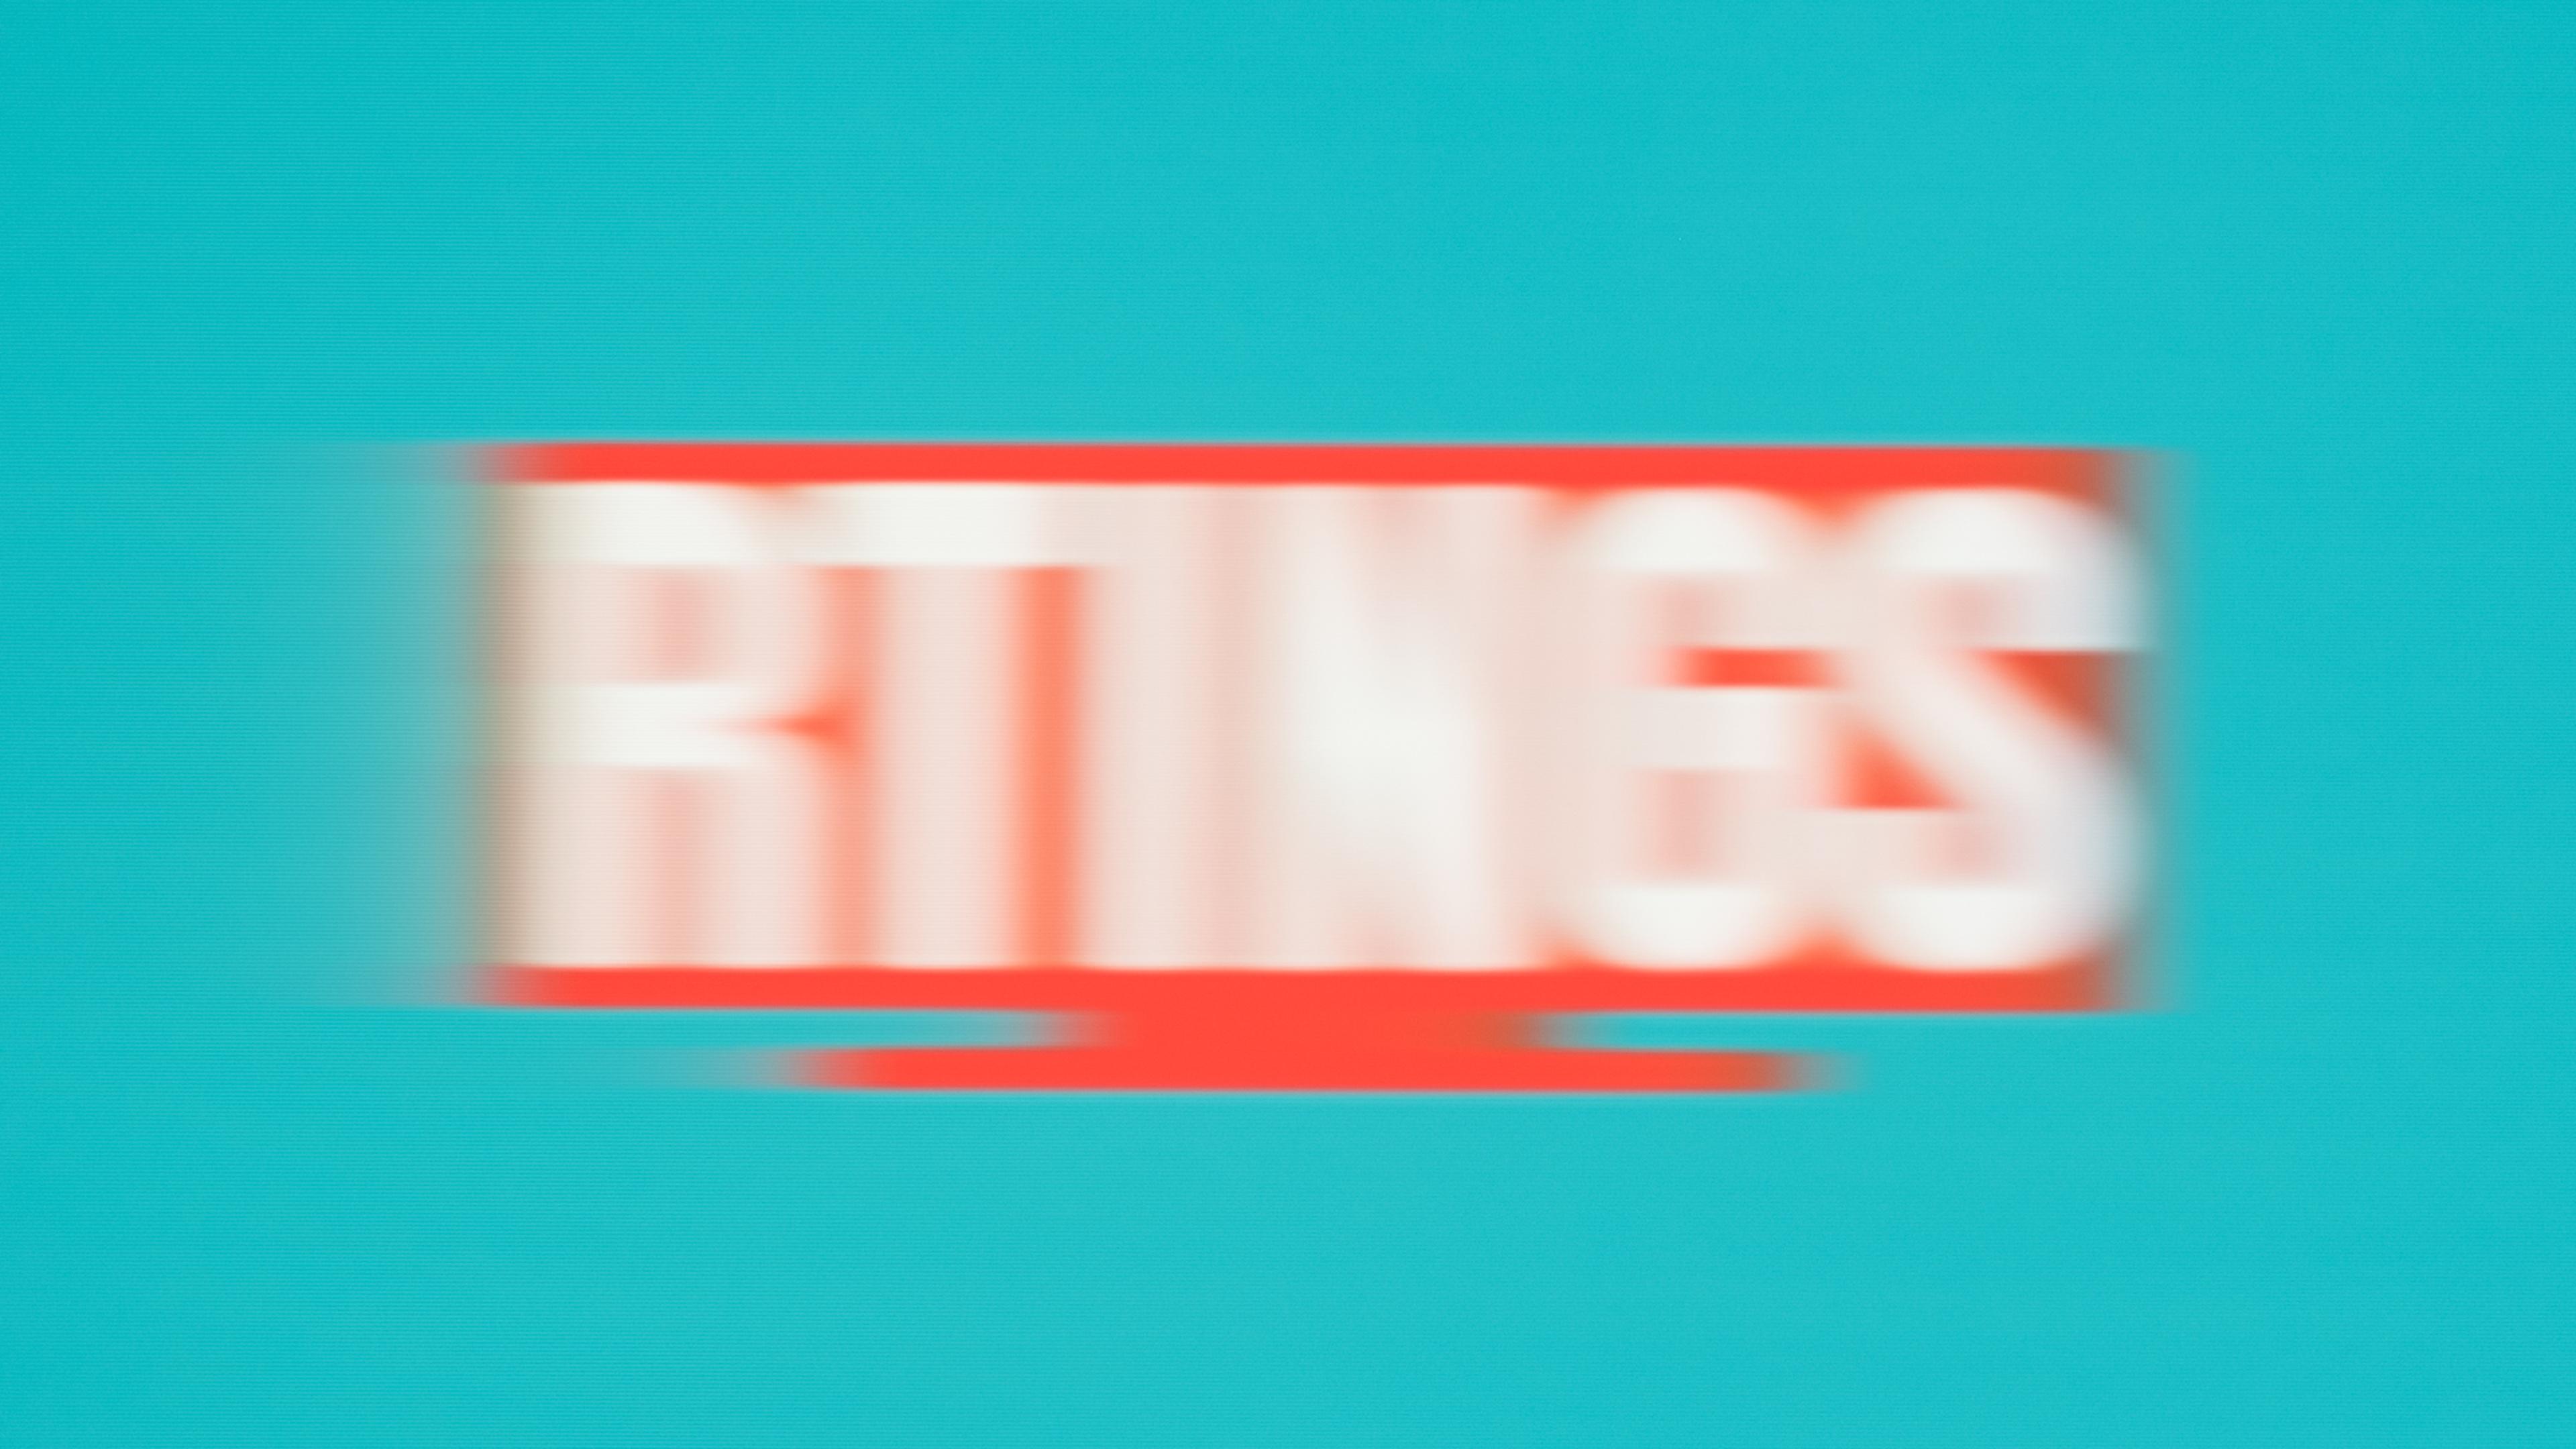 Image Flicker Of TVs: Black Frame Insertion - RTINGS com